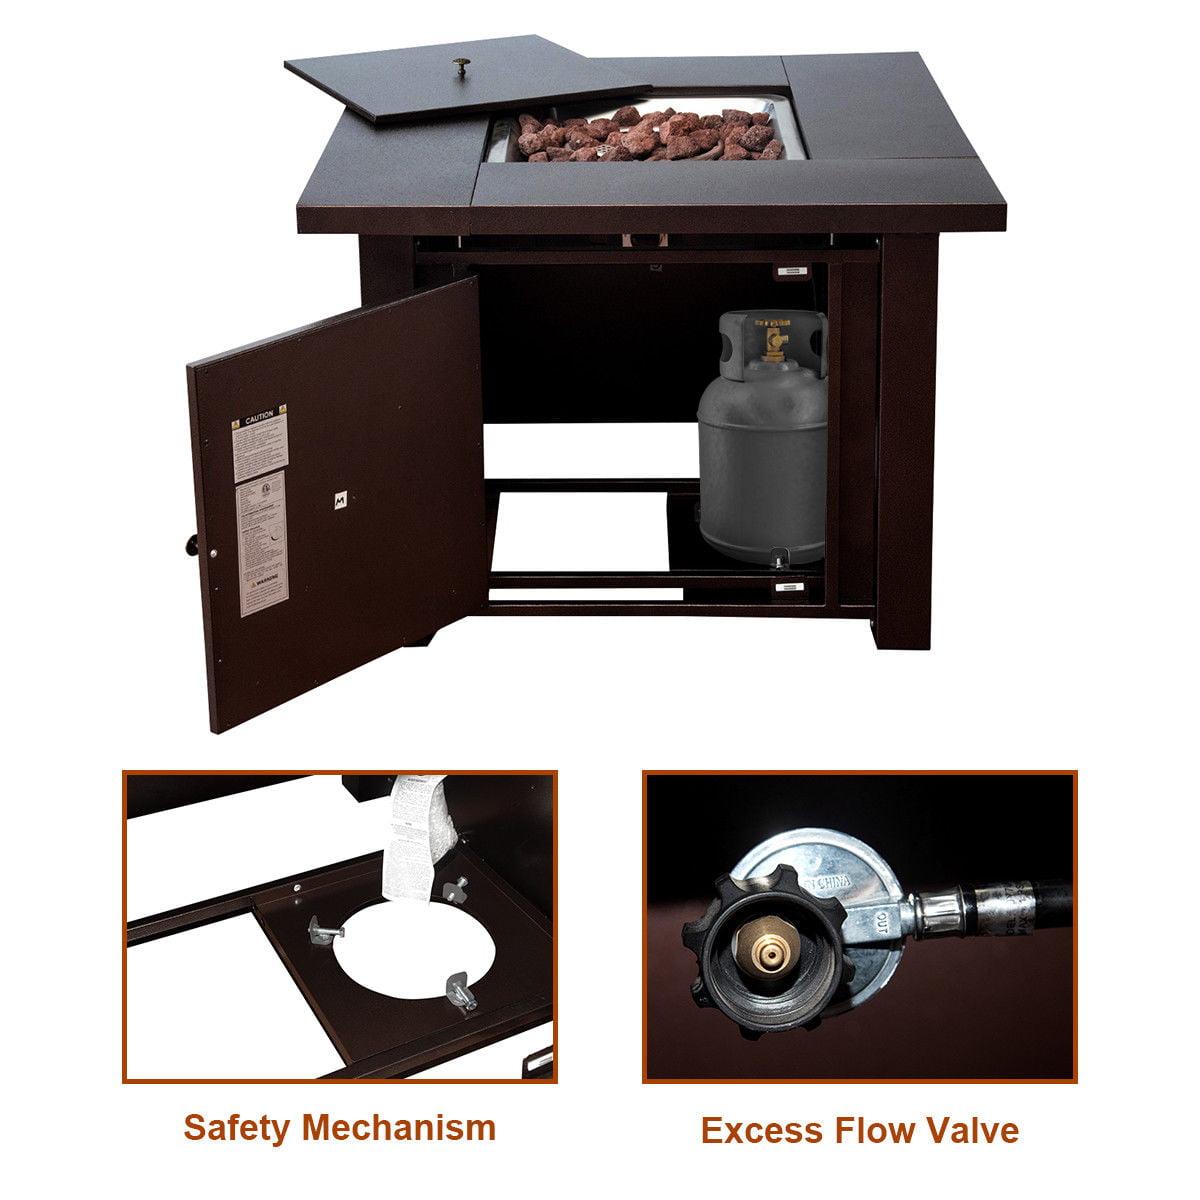 "Costway 38"" Square Patio Heater Propane Gas Fire Pit Table 40000 BTUs Outdoor - image 5 de 10"